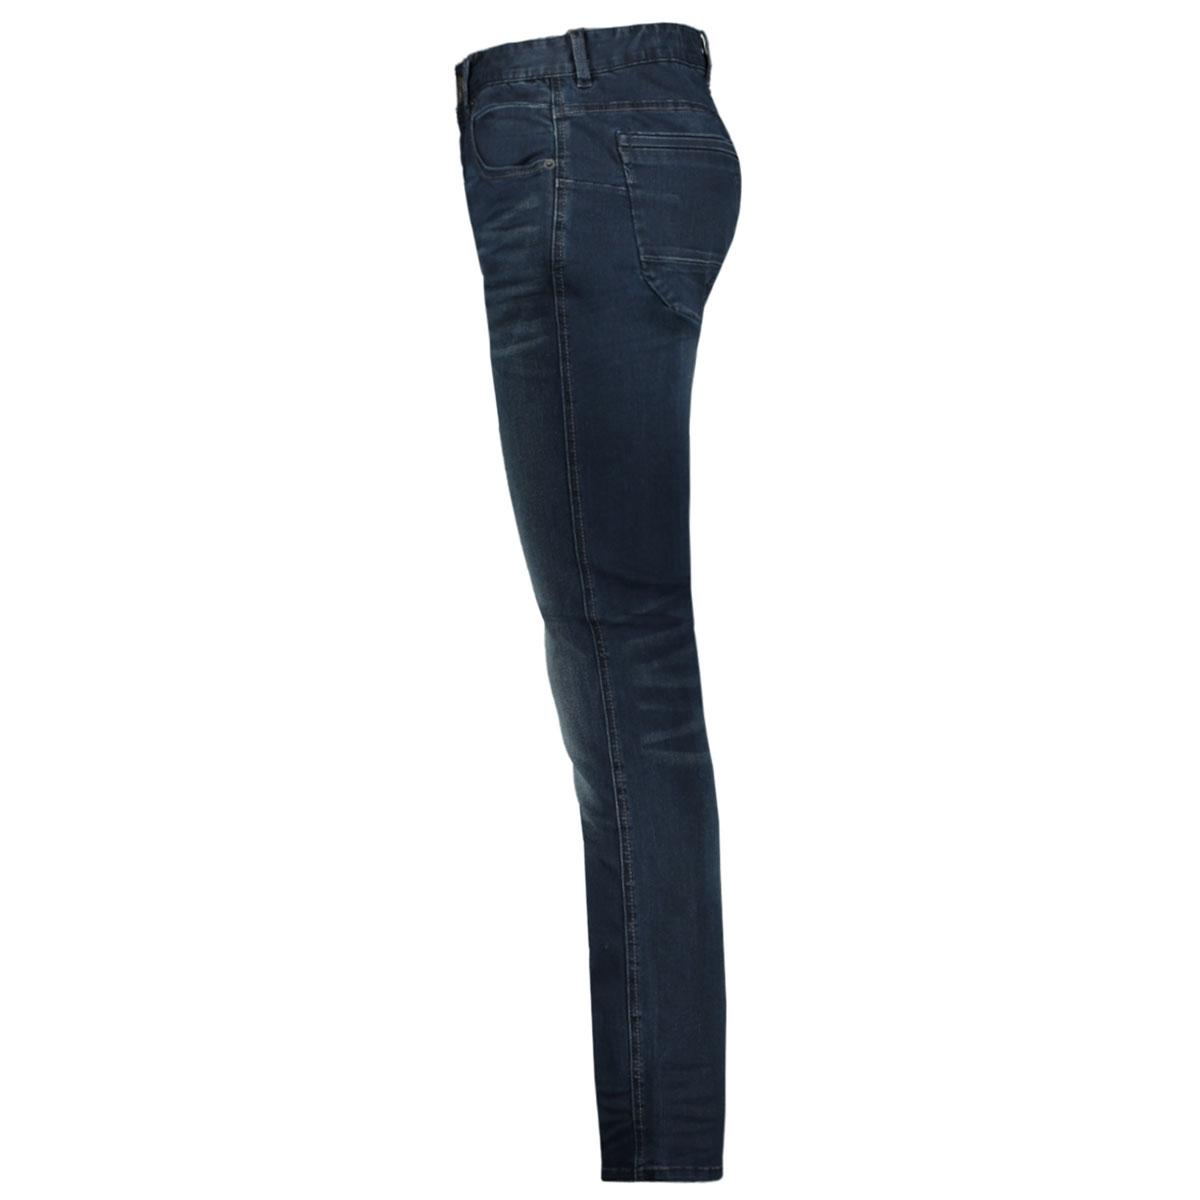 nightflight jeans ptr120 pme legend jeans lmb